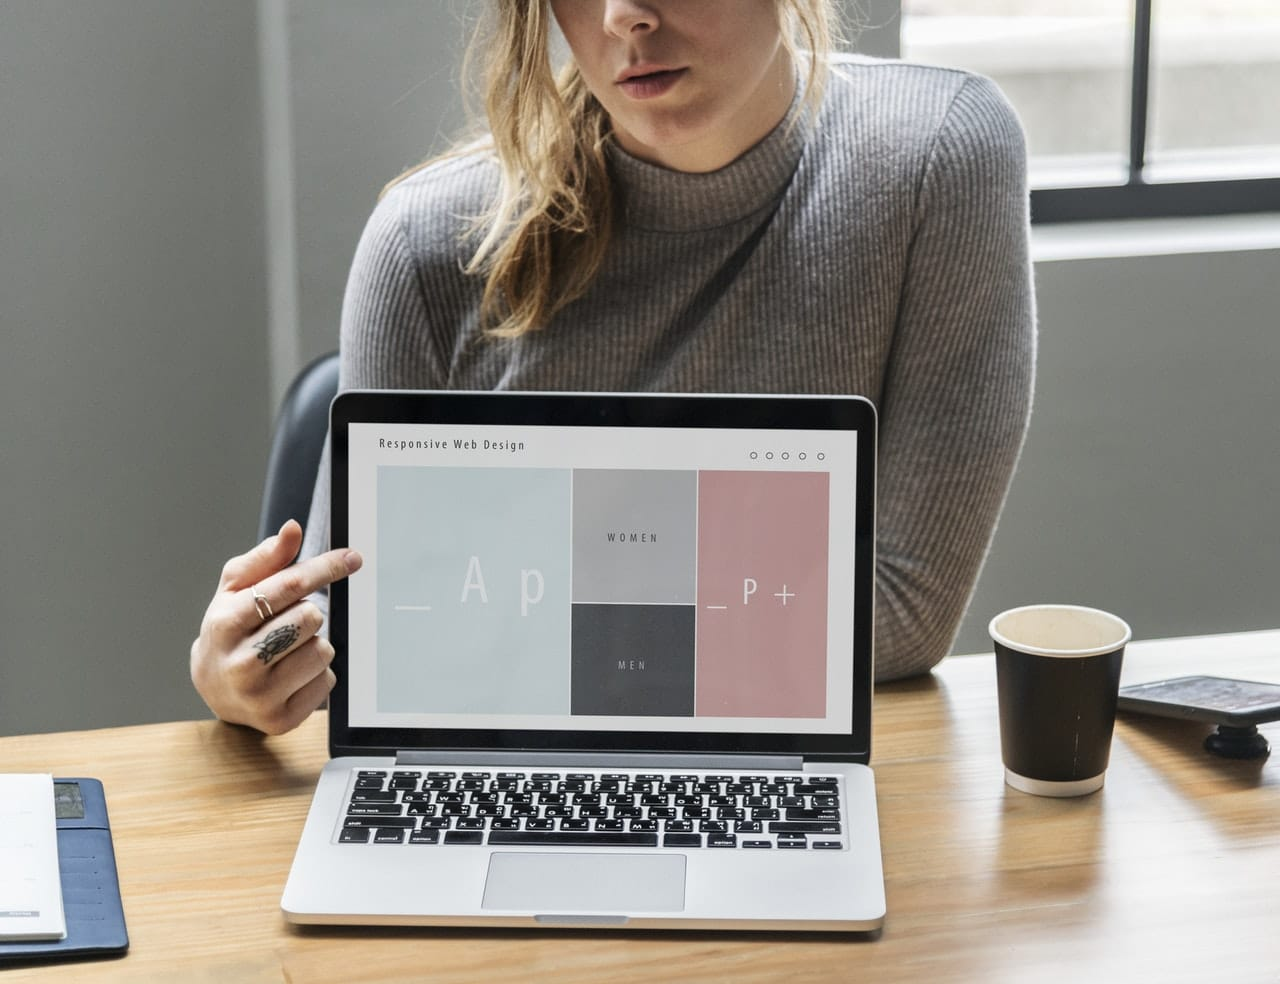 6 Benefits Quality Web Design Article Image